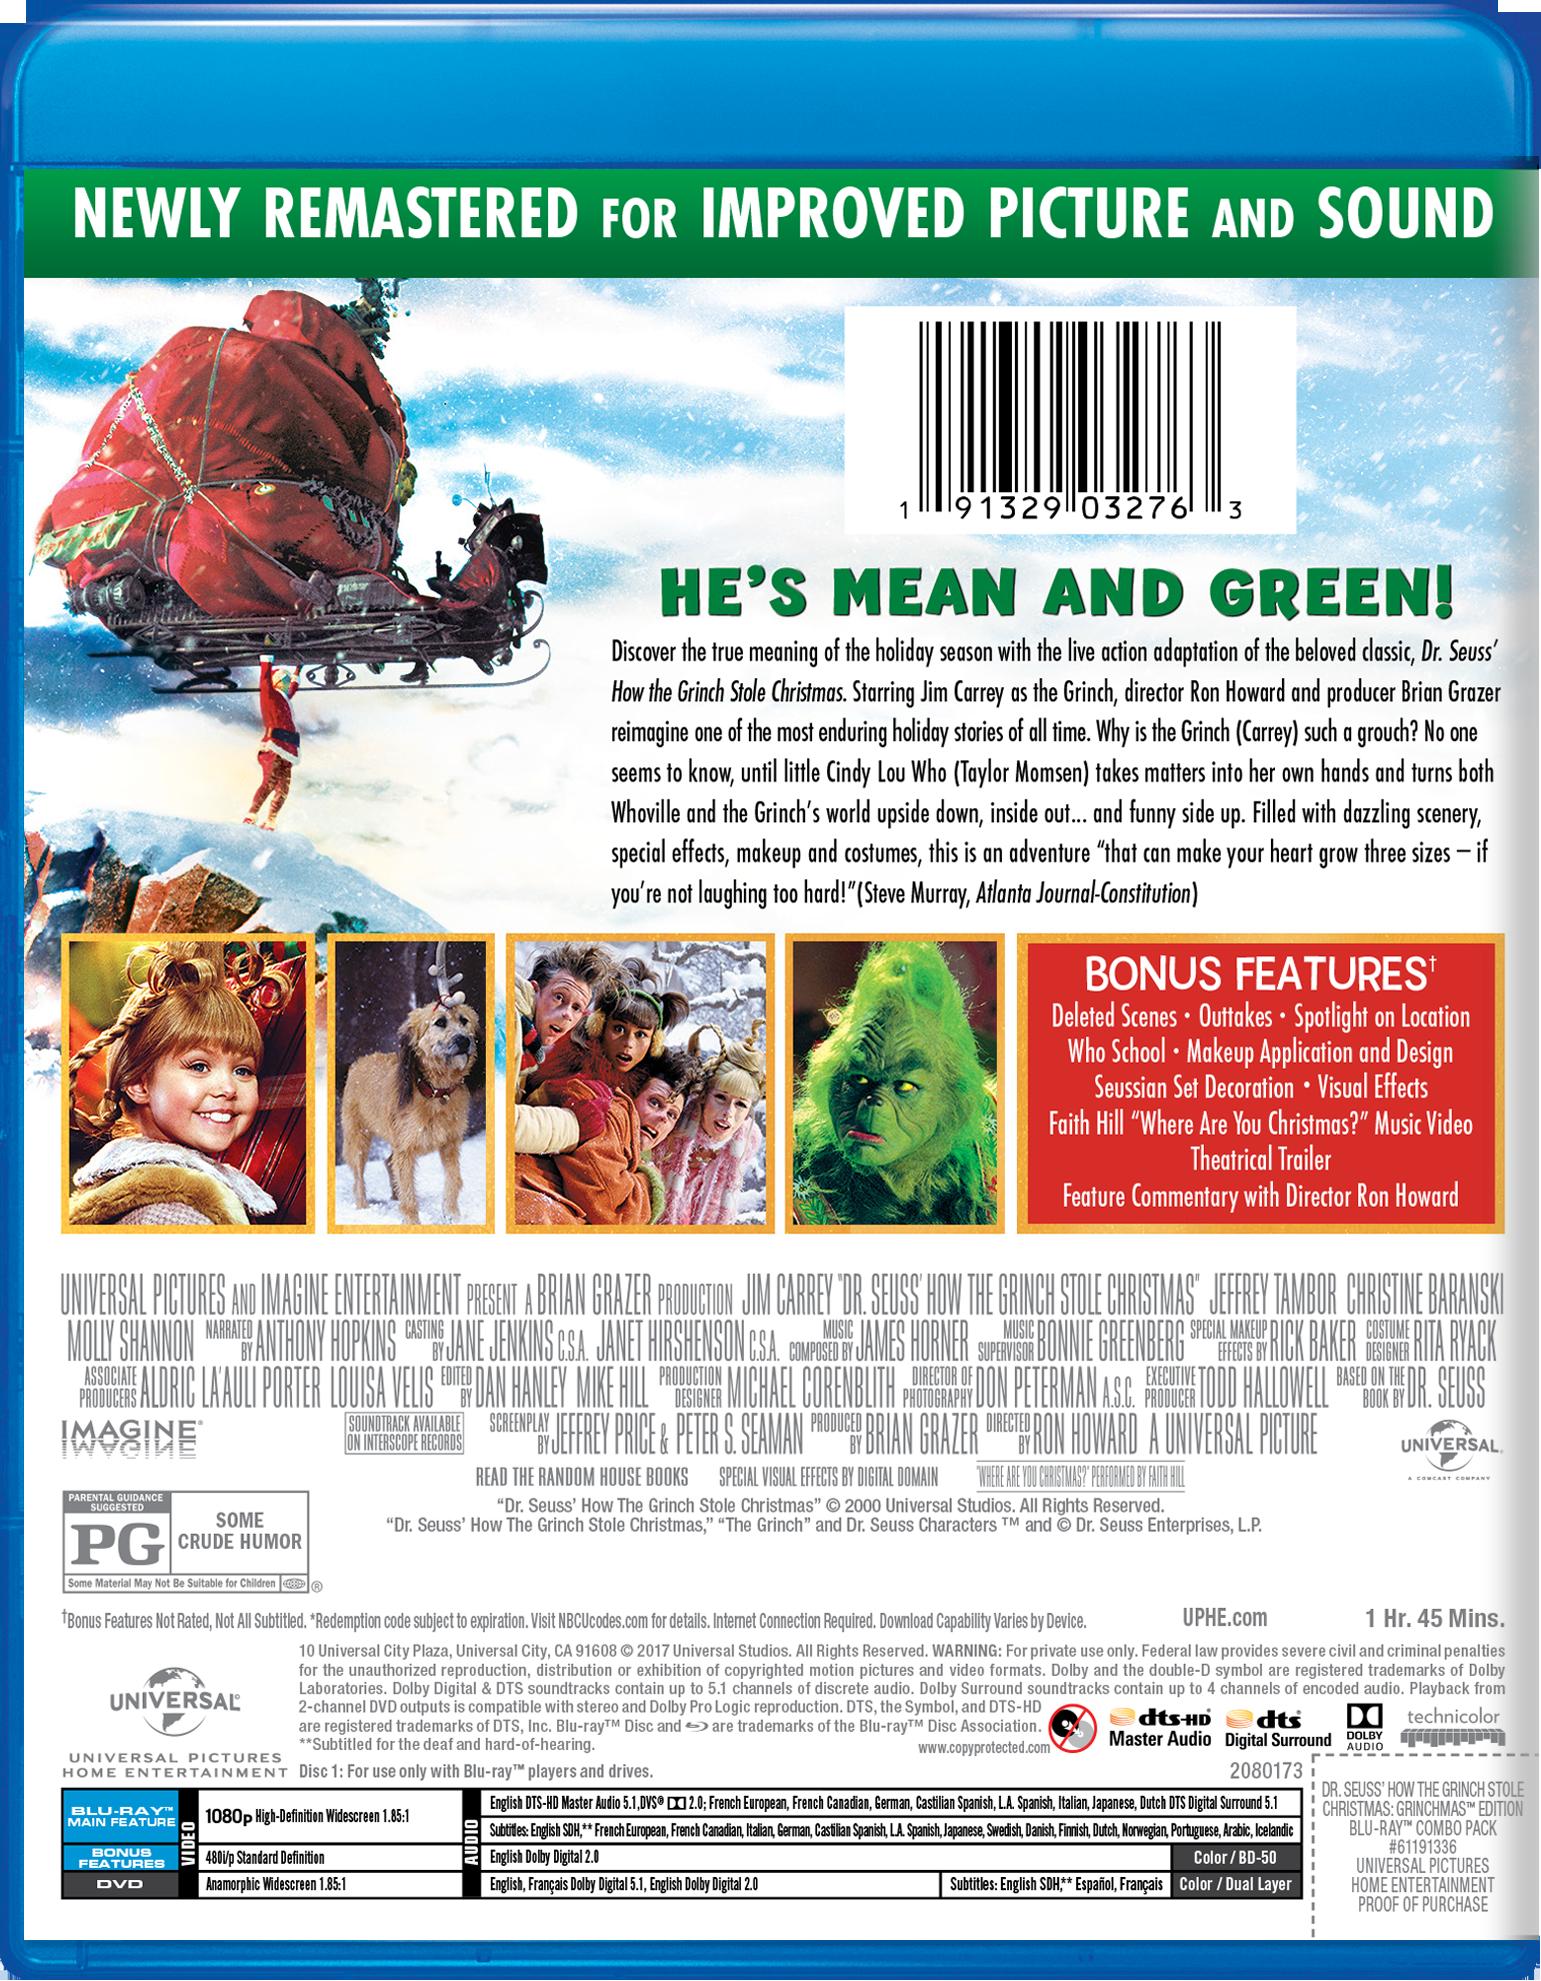 dr seuss how the grinch stole christmas grinchmas edition blu ray dvd digital hd walmartcom - How The Grinch Stole Christmas Blu Ray